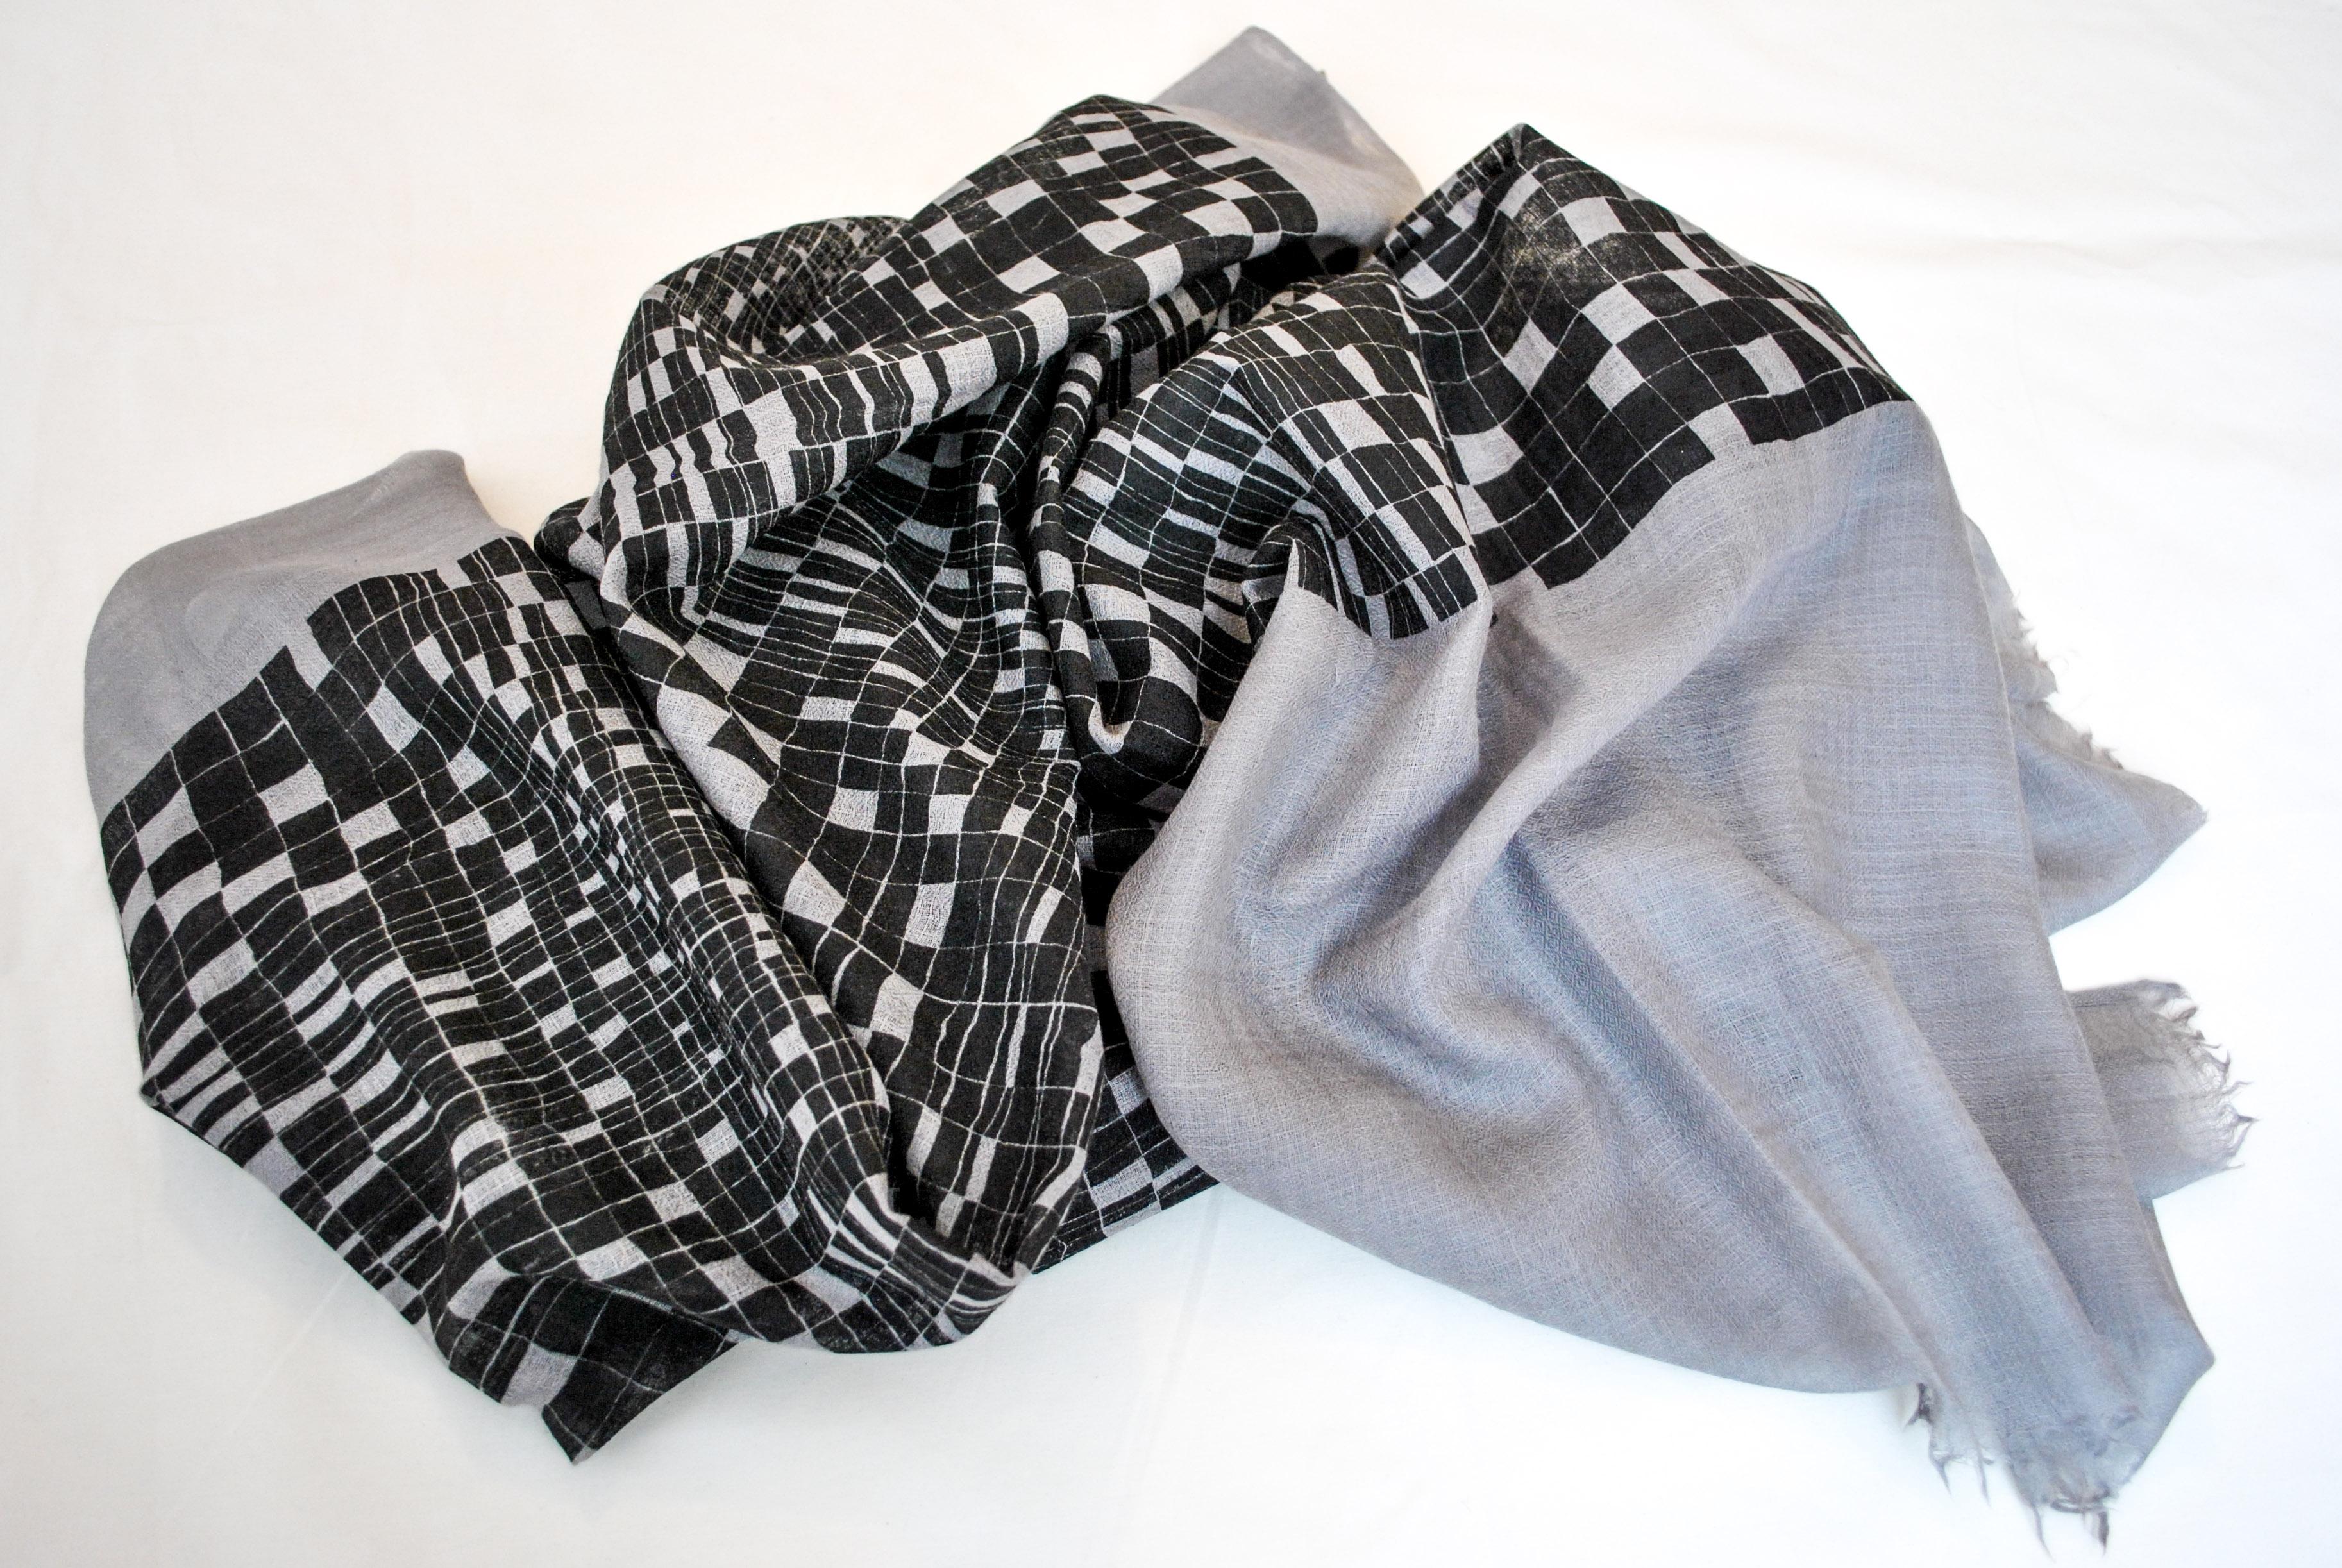 Drawn scarf printed CHESSPUZZLE: a handprinted 100% drawn